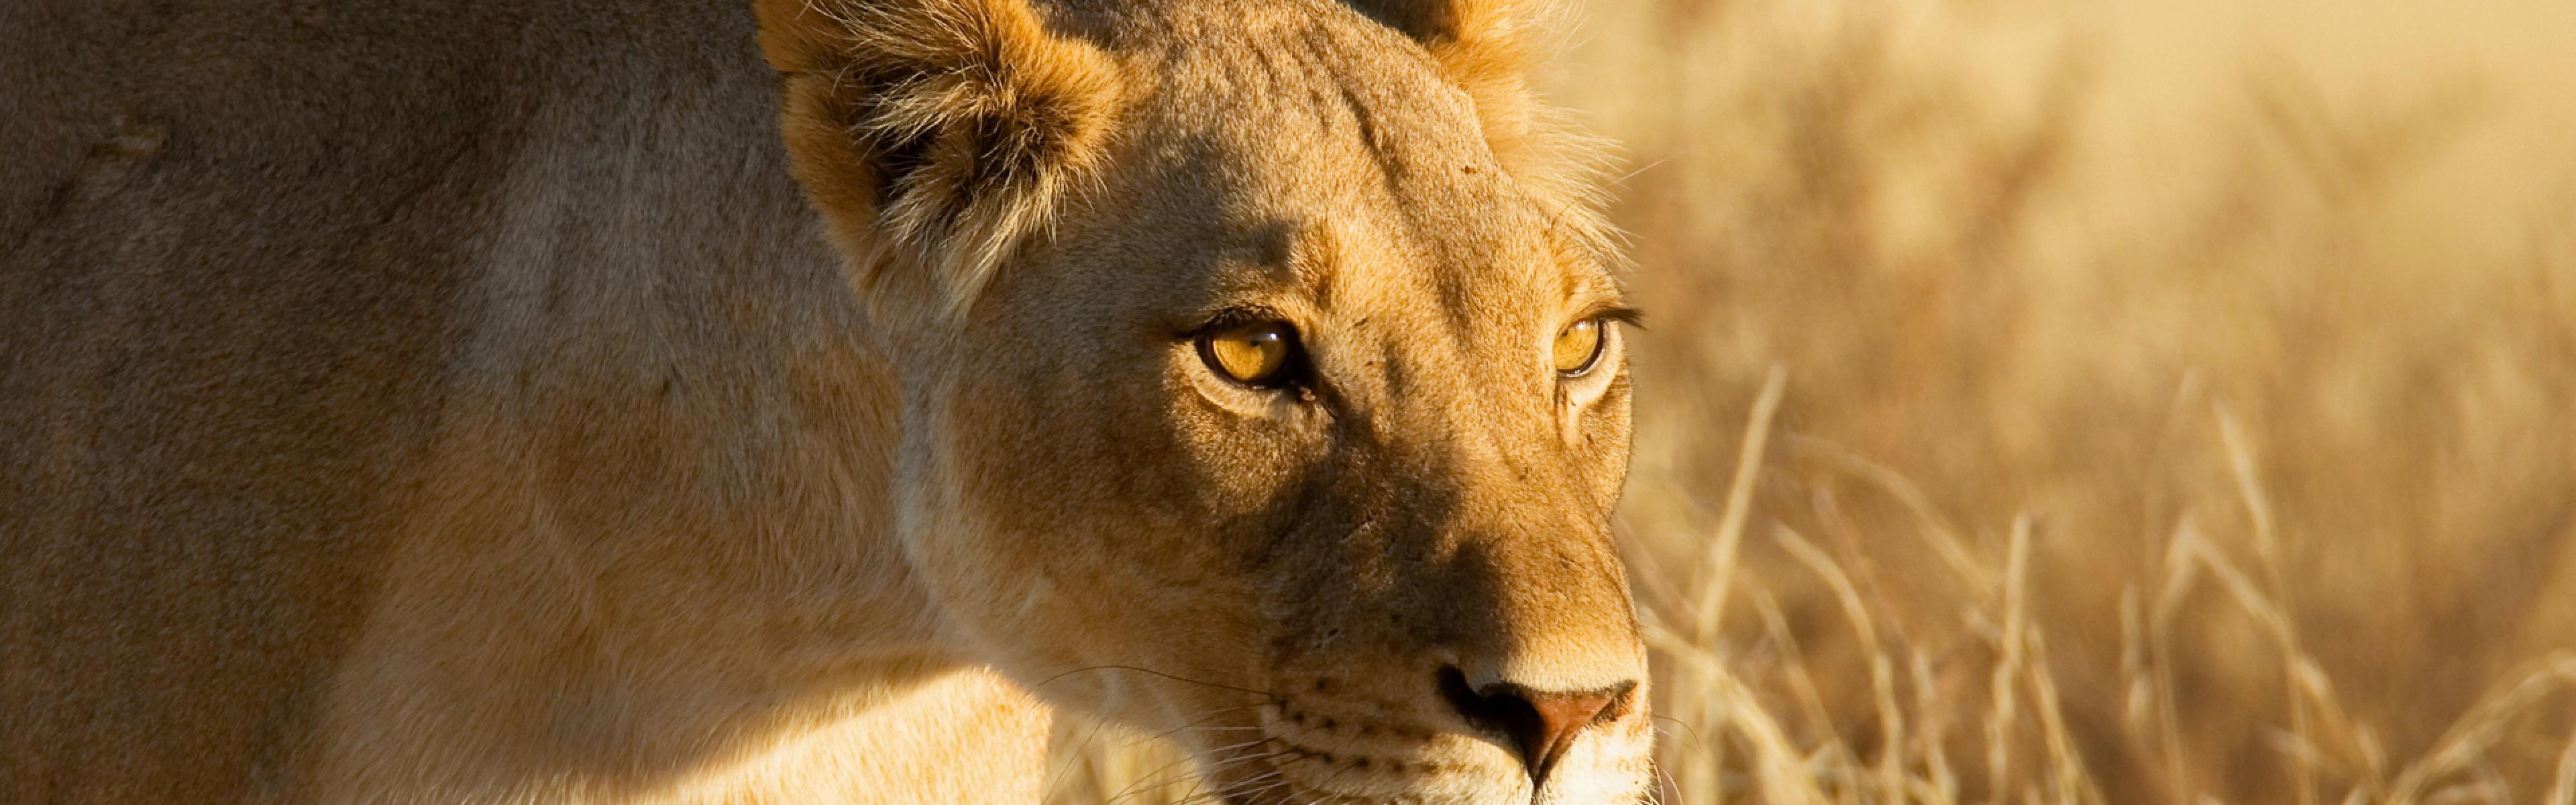 Lioness Background